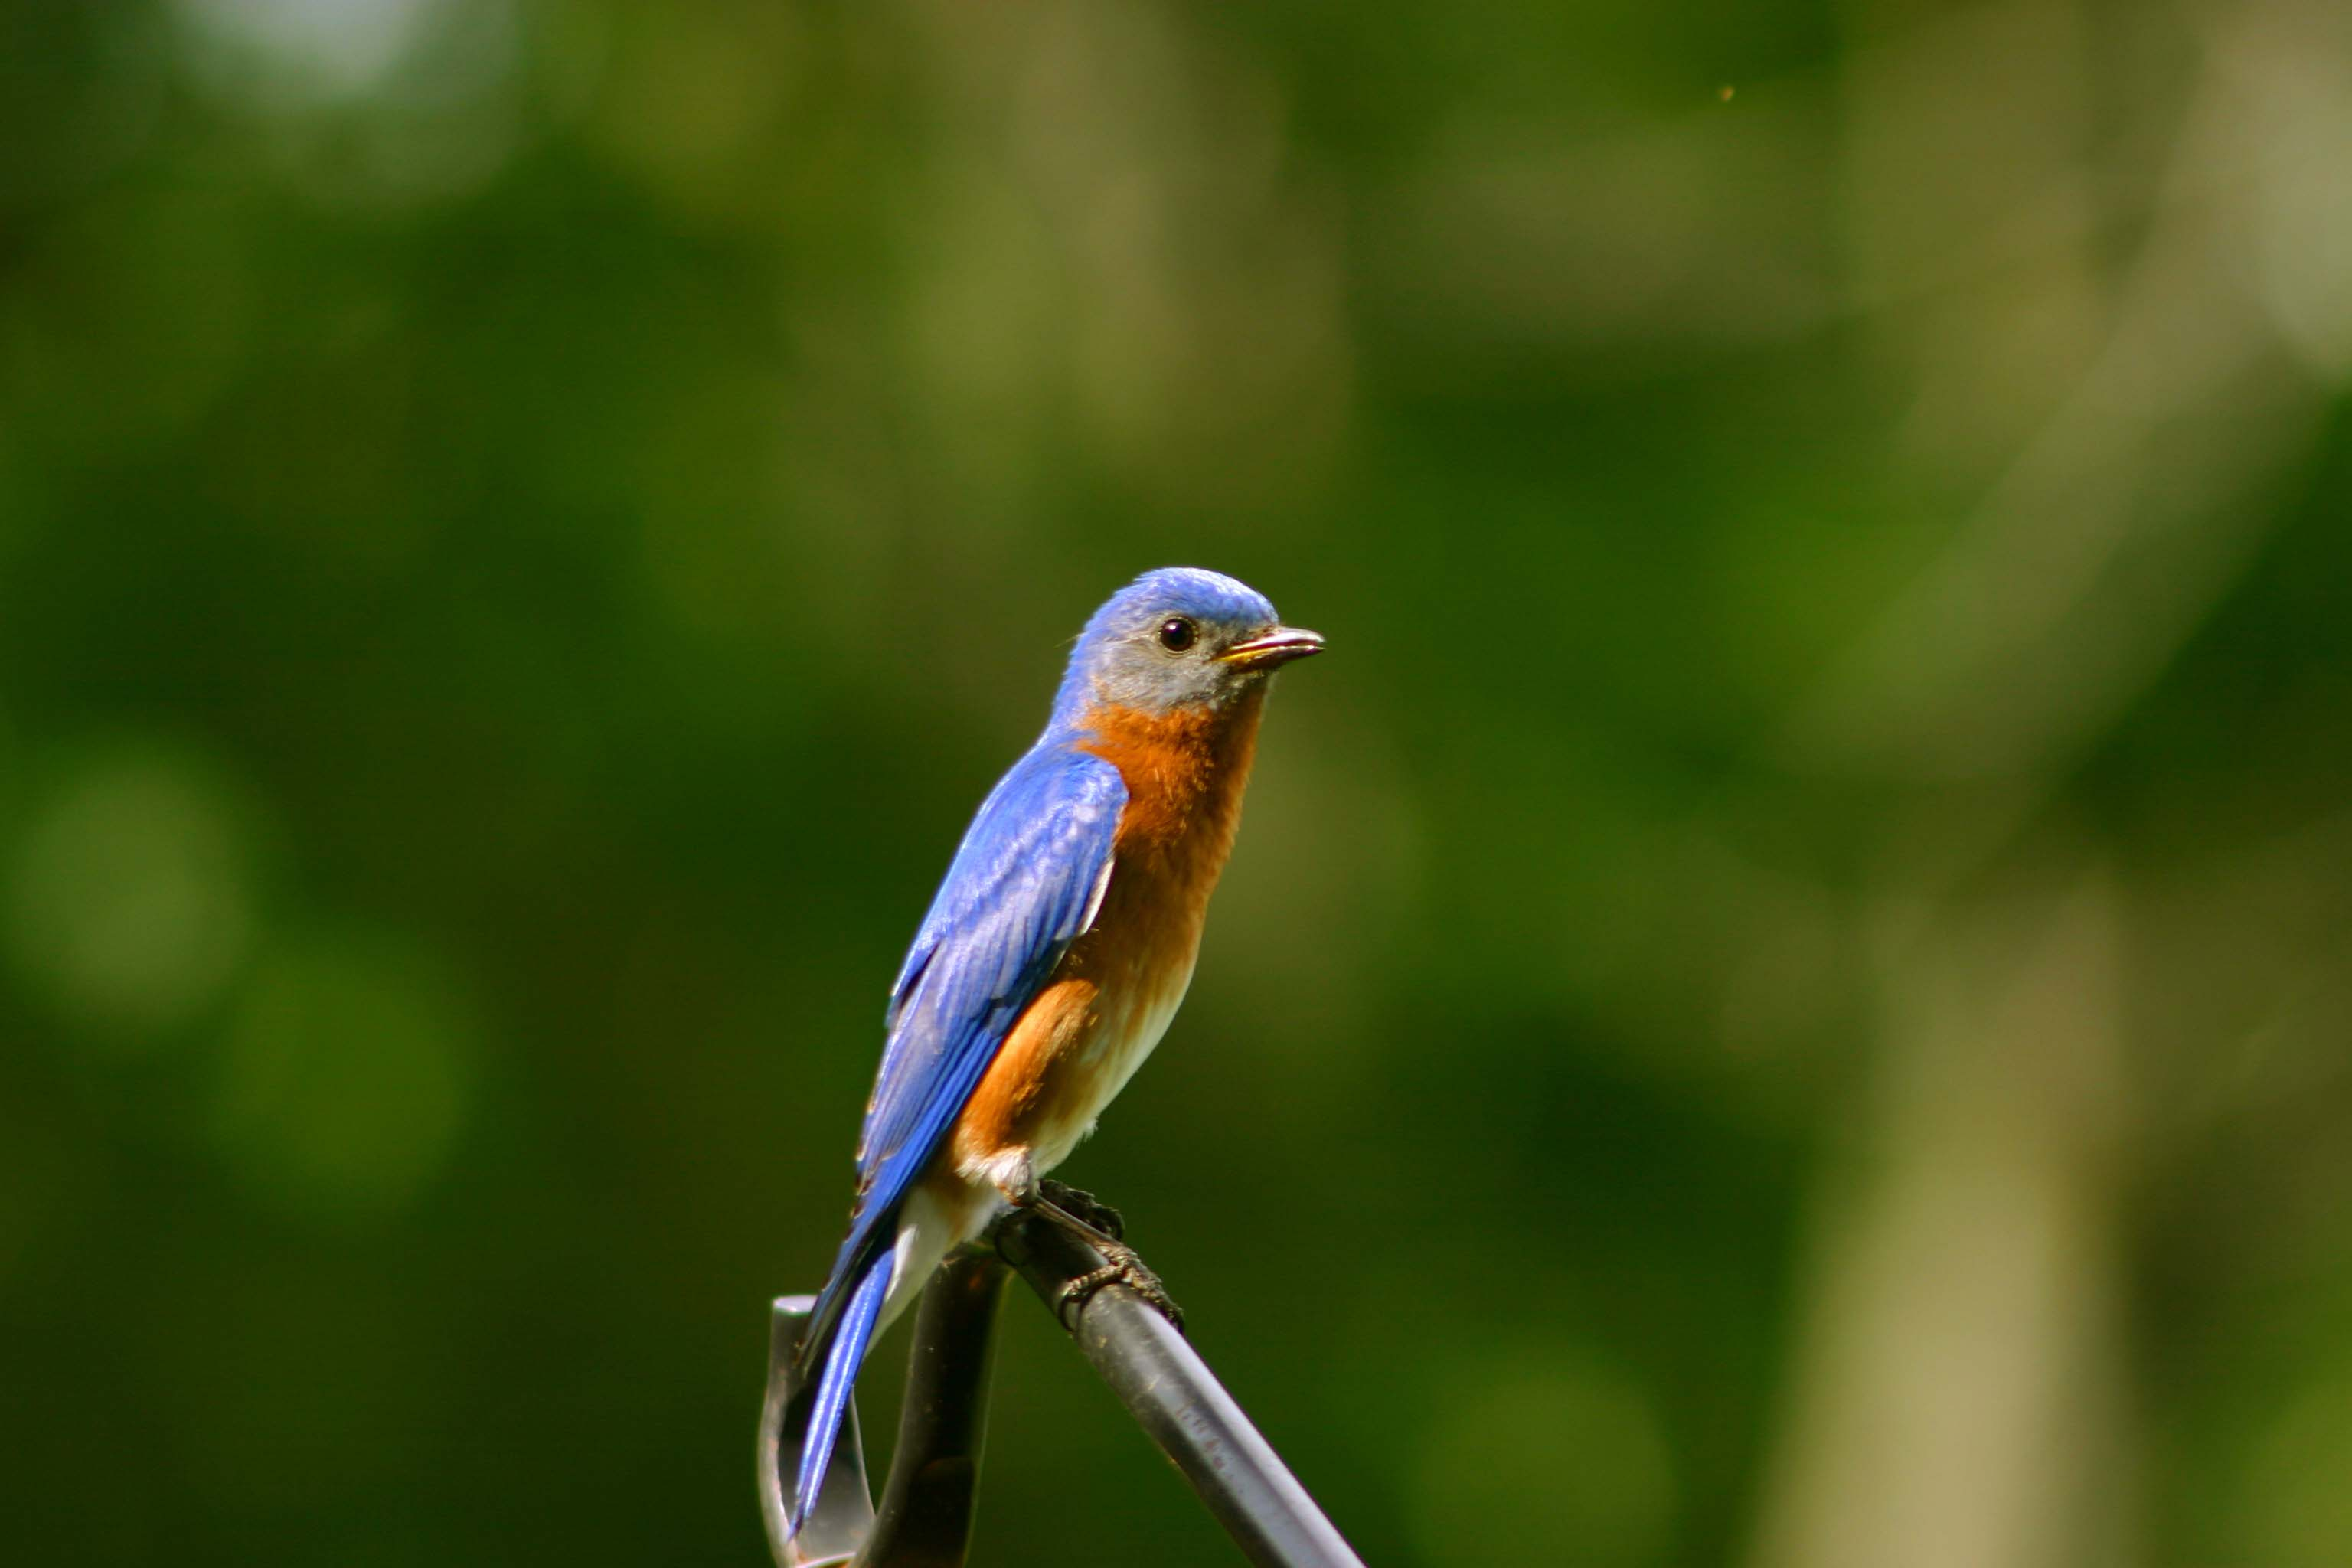 Male Bluebird 11MAY07.jpg